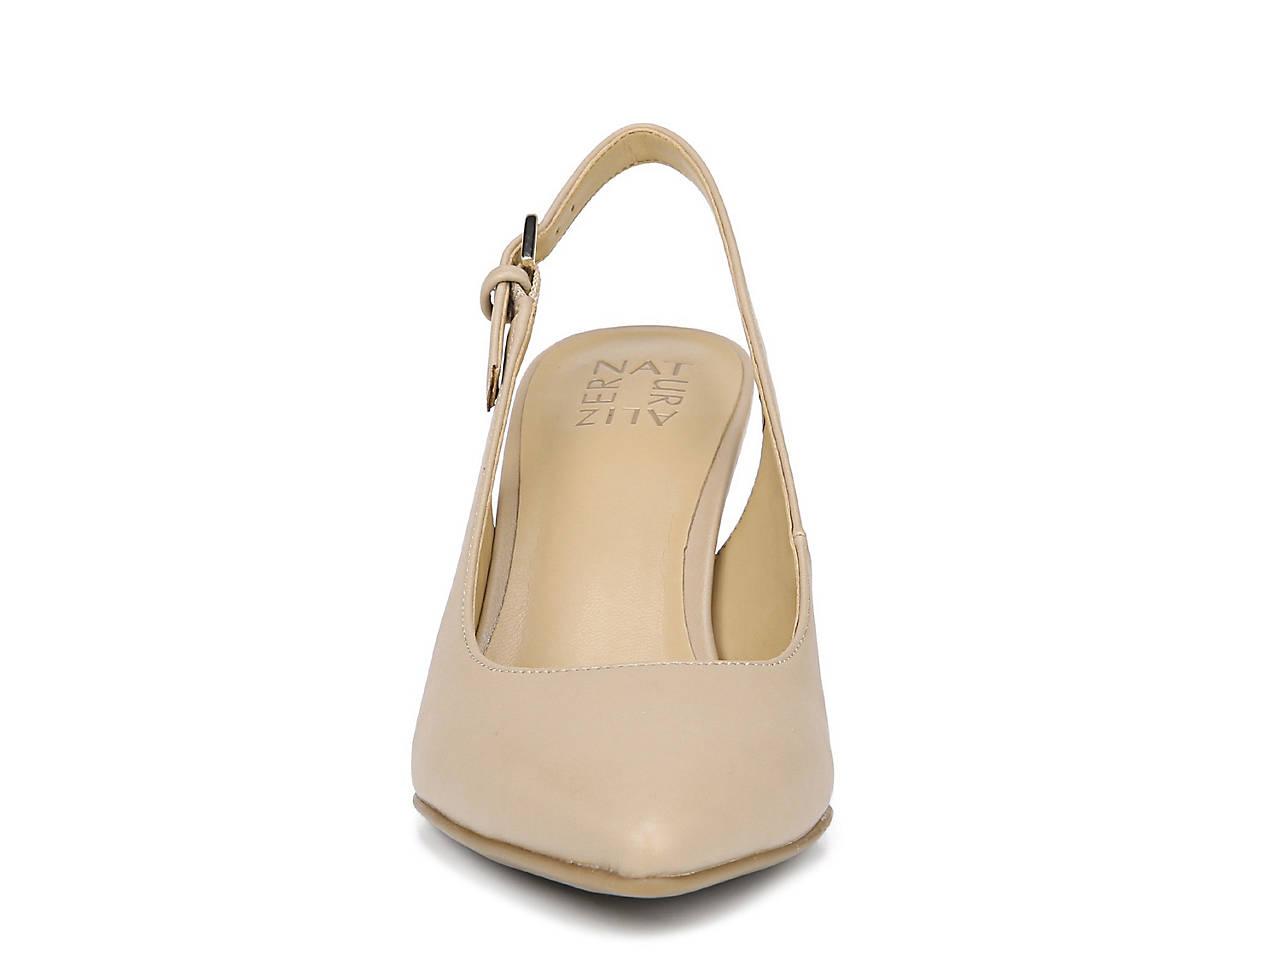 7cd58033560 Naturalizer Morgan Pump Women s Shoes